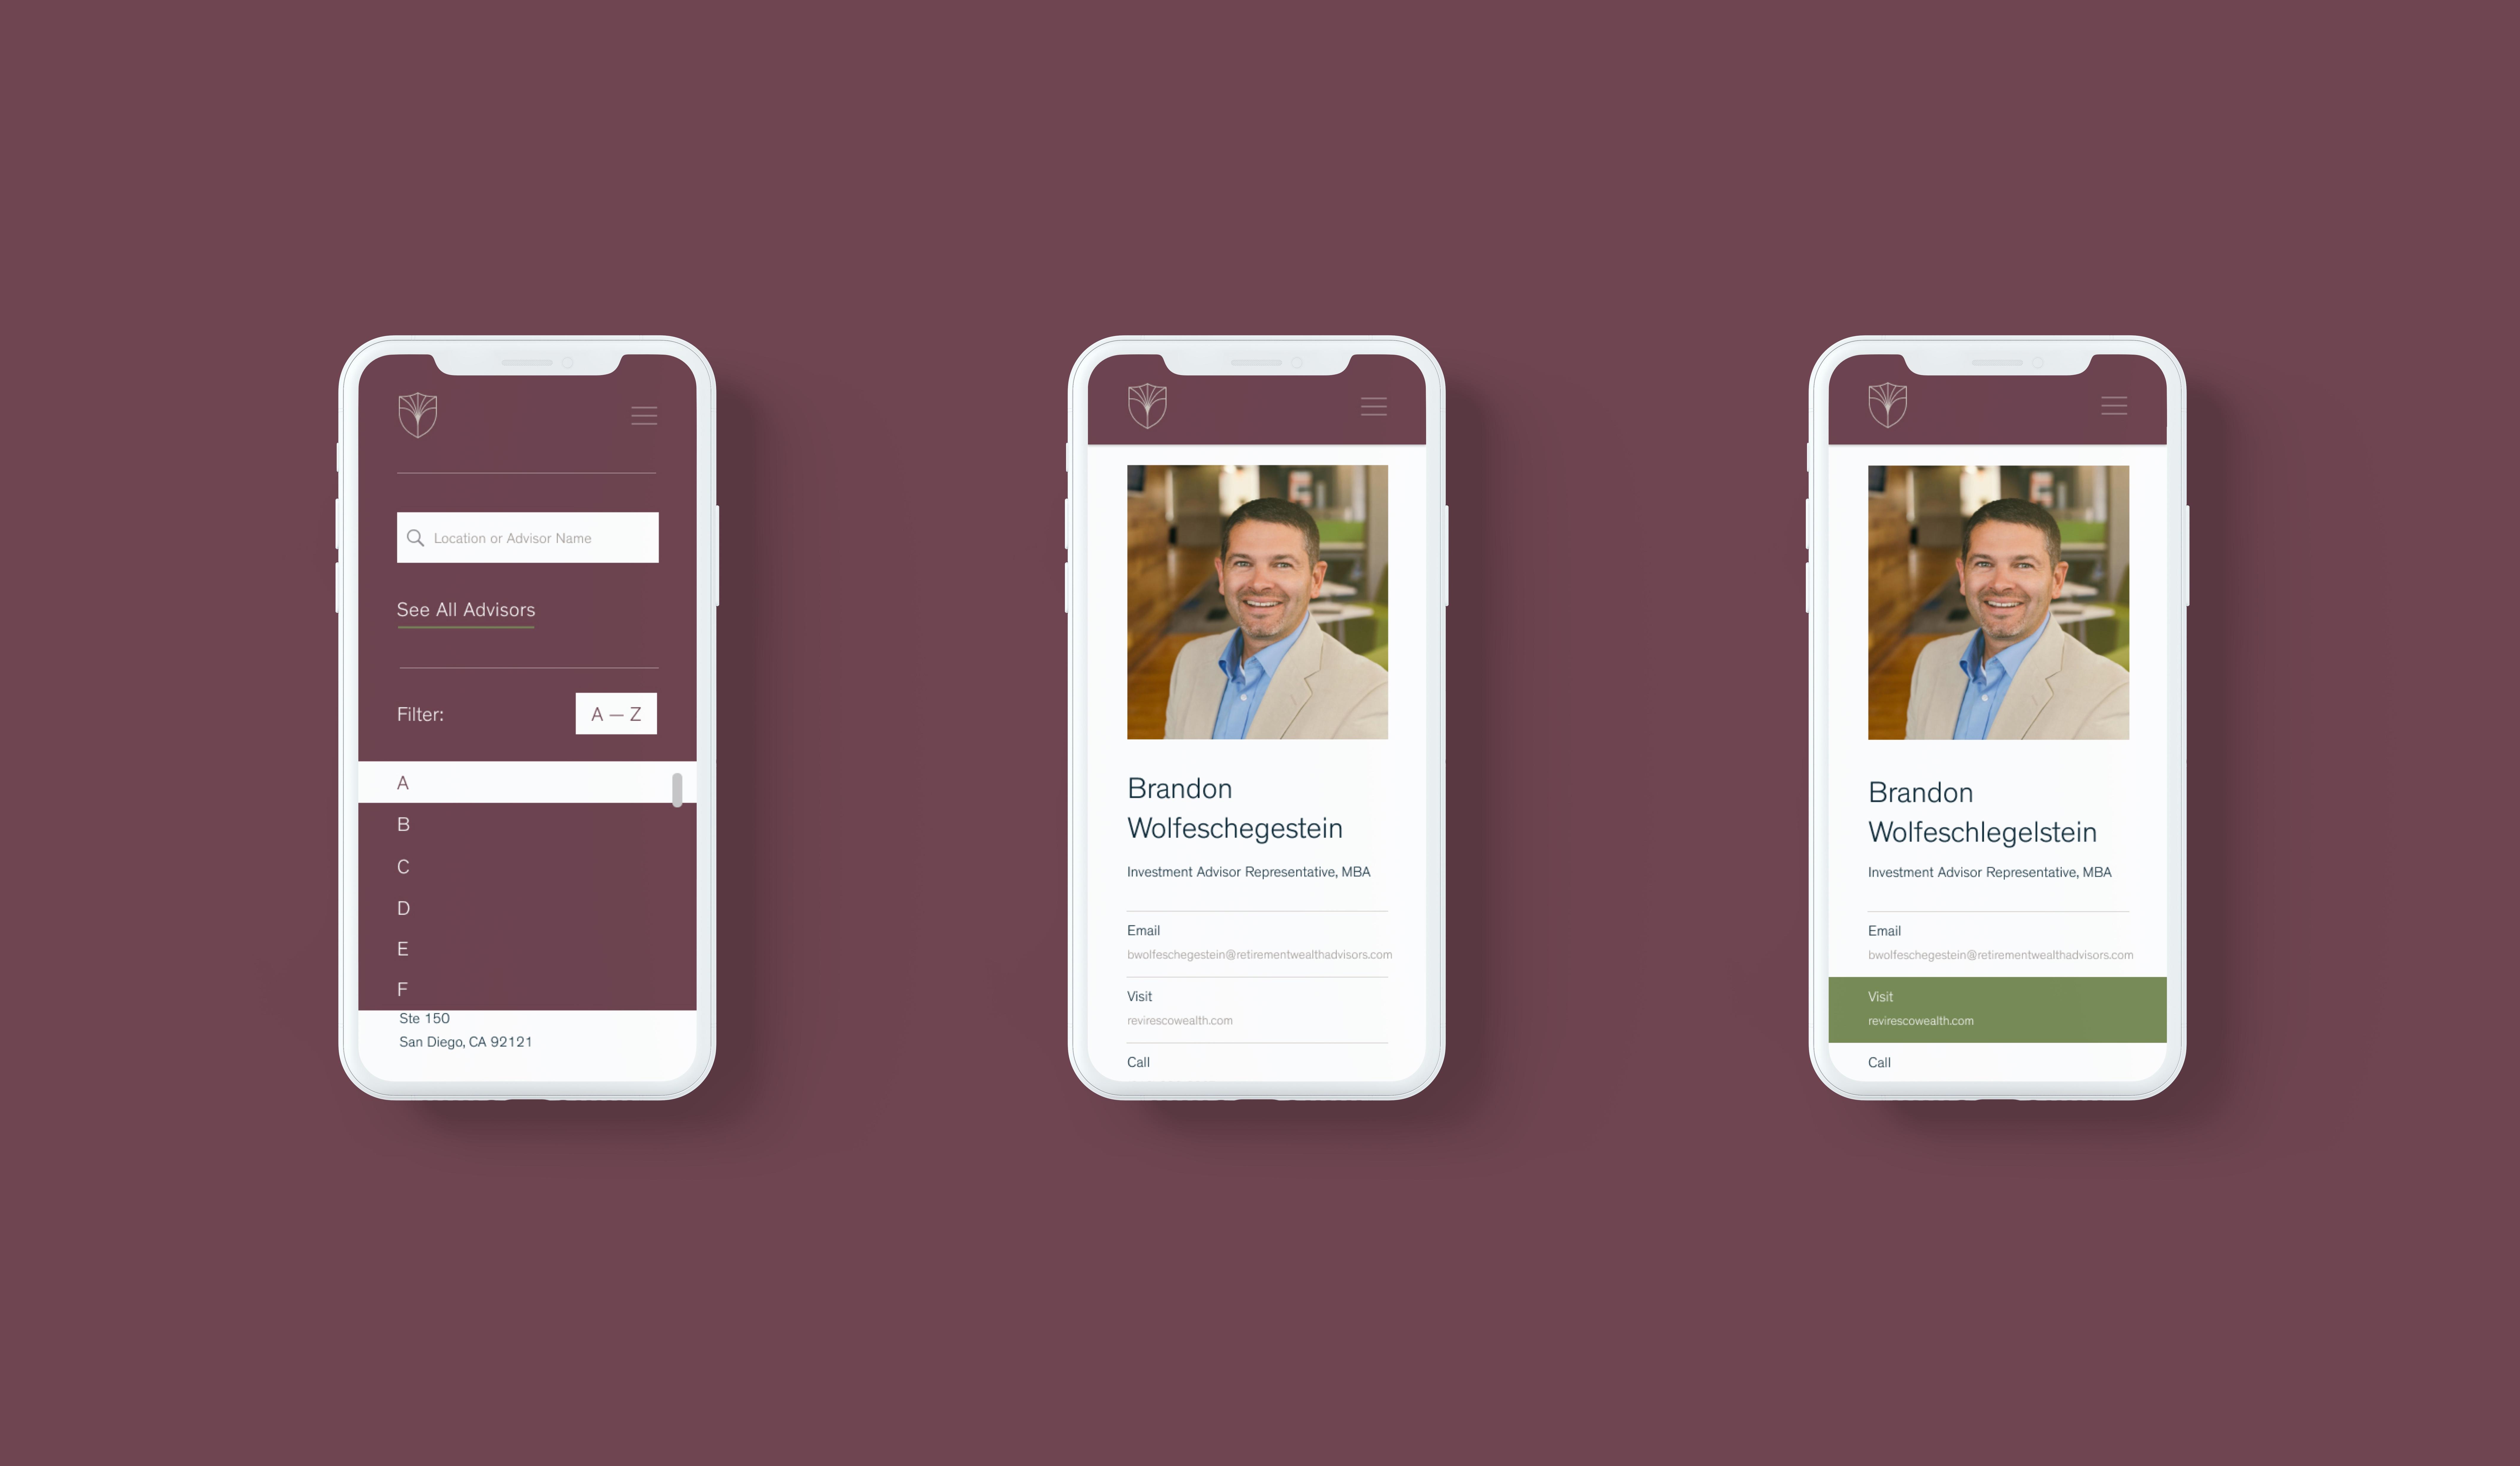 Advisor Directory, mobile interaction showcase